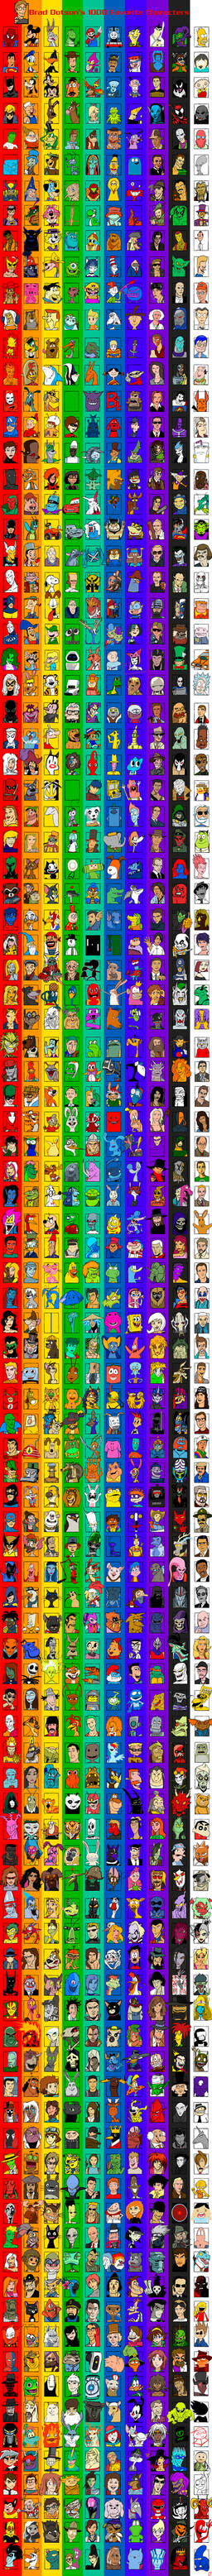 Brad Dotson's 1000 Character Meme